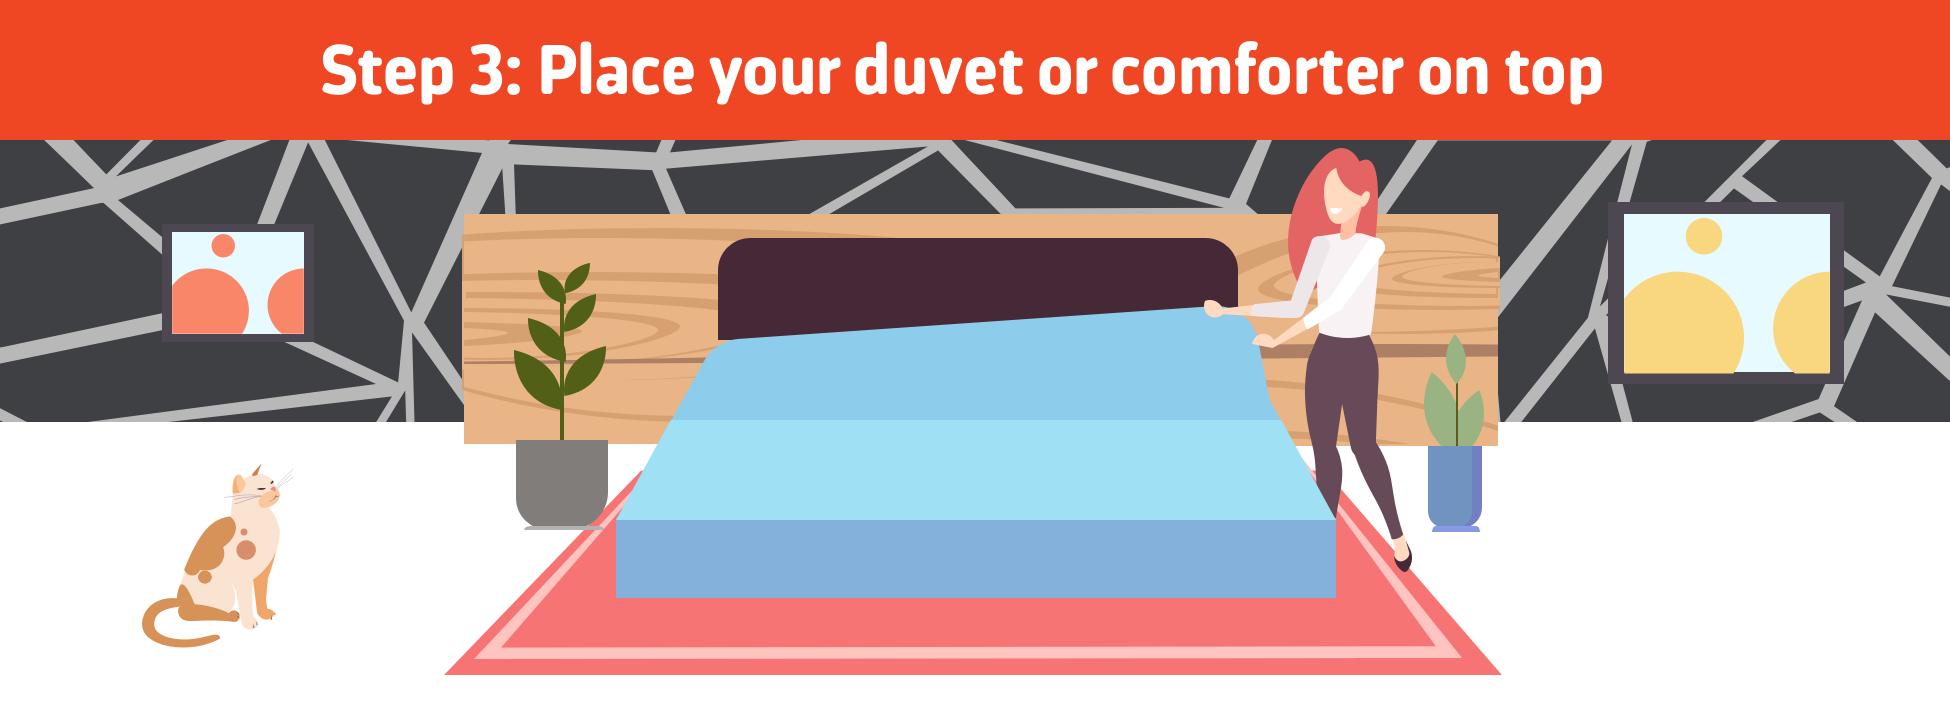 comforter or duvet over your sheet